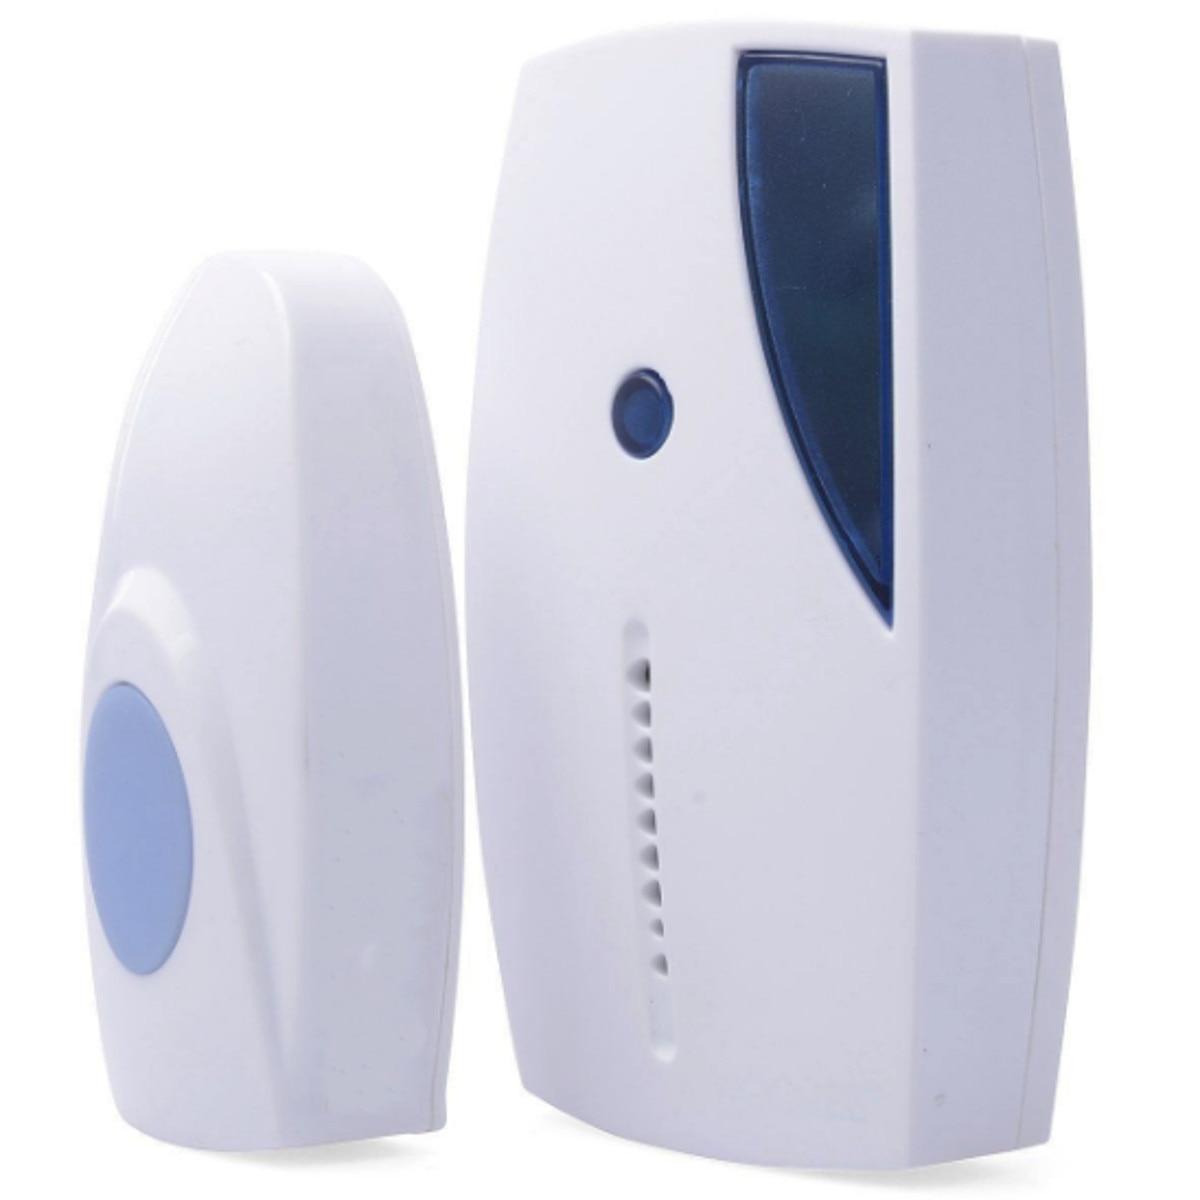 NEW 36 Tune Chimes Songs Waterproof LED Wireless Doorbell Remote Control Door Bell household 36 songs smart wireless doorbell remote control 100m range waterproof cordless intelligent doorbell fuli